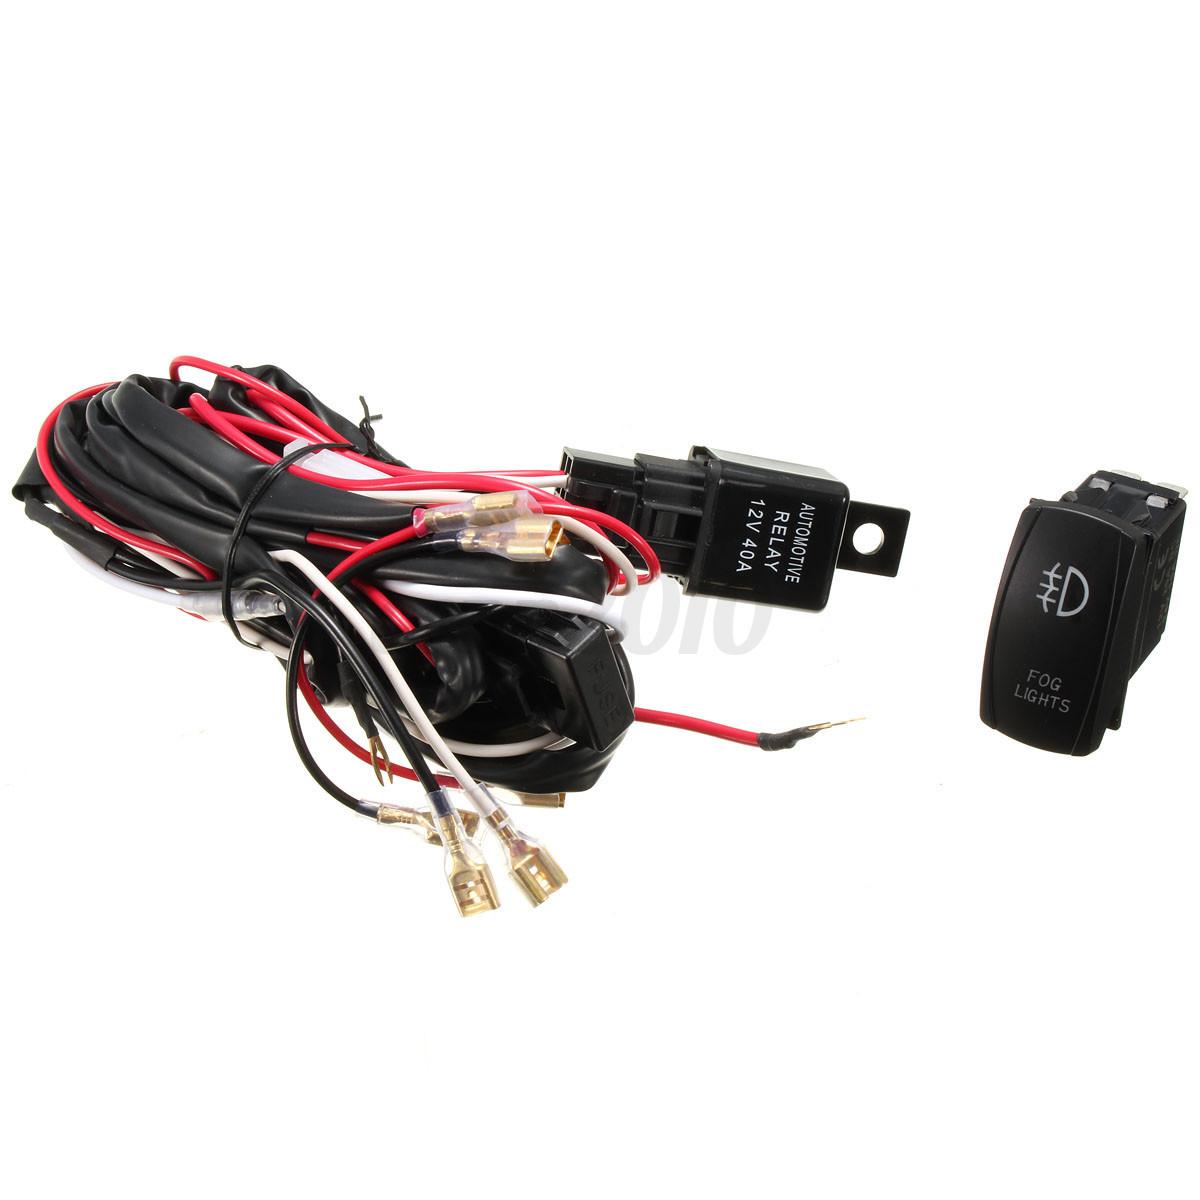 Rocker Switch Wiring Diagram 5 Pin Wiring Harness Wiring Diagram